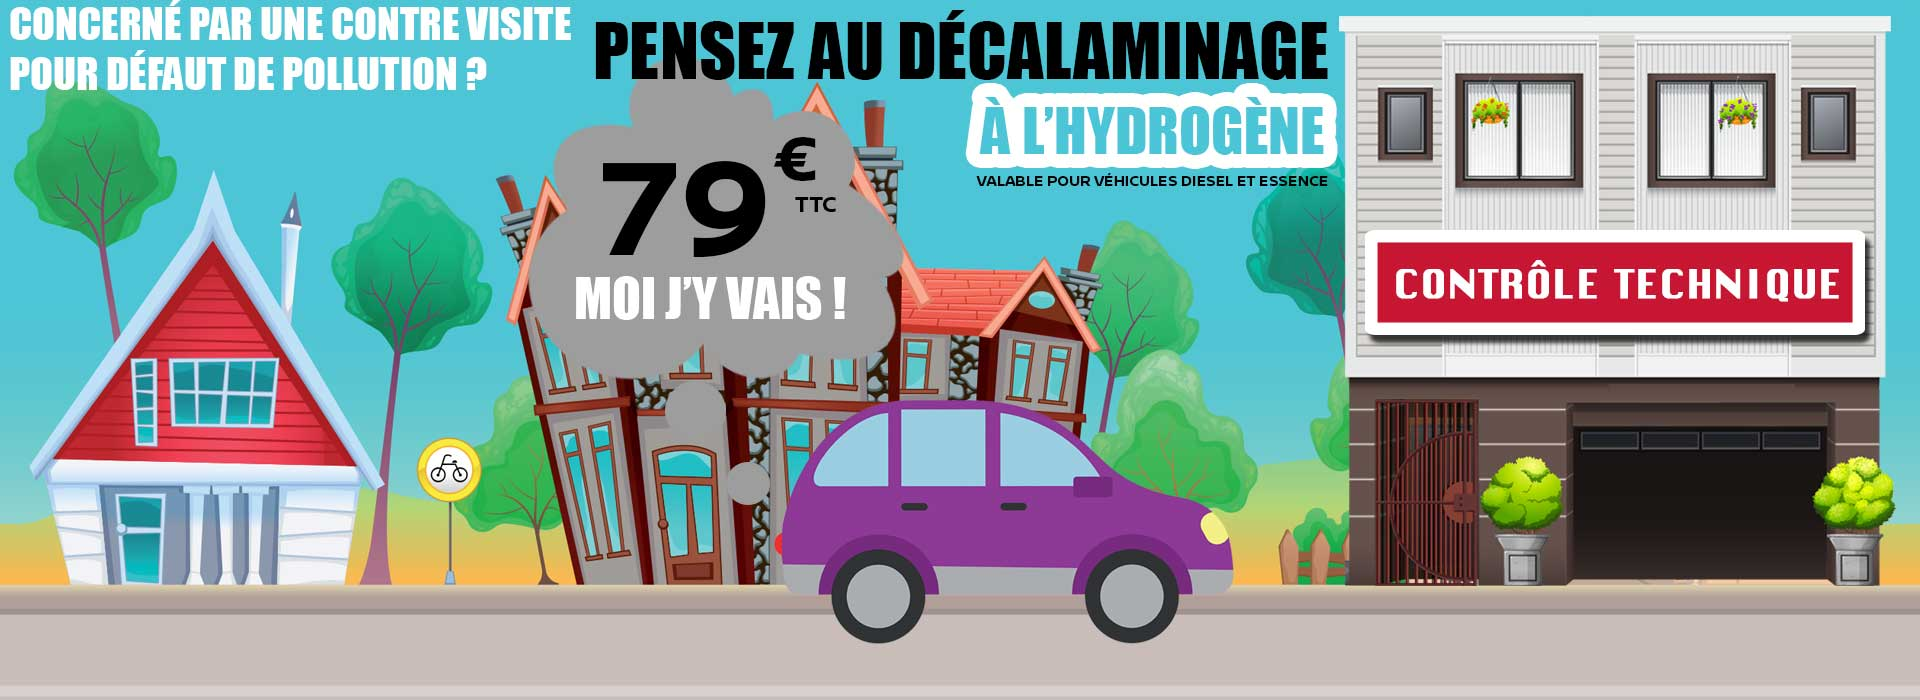 Defaut Pollution Decalaminage A Lhydrogene